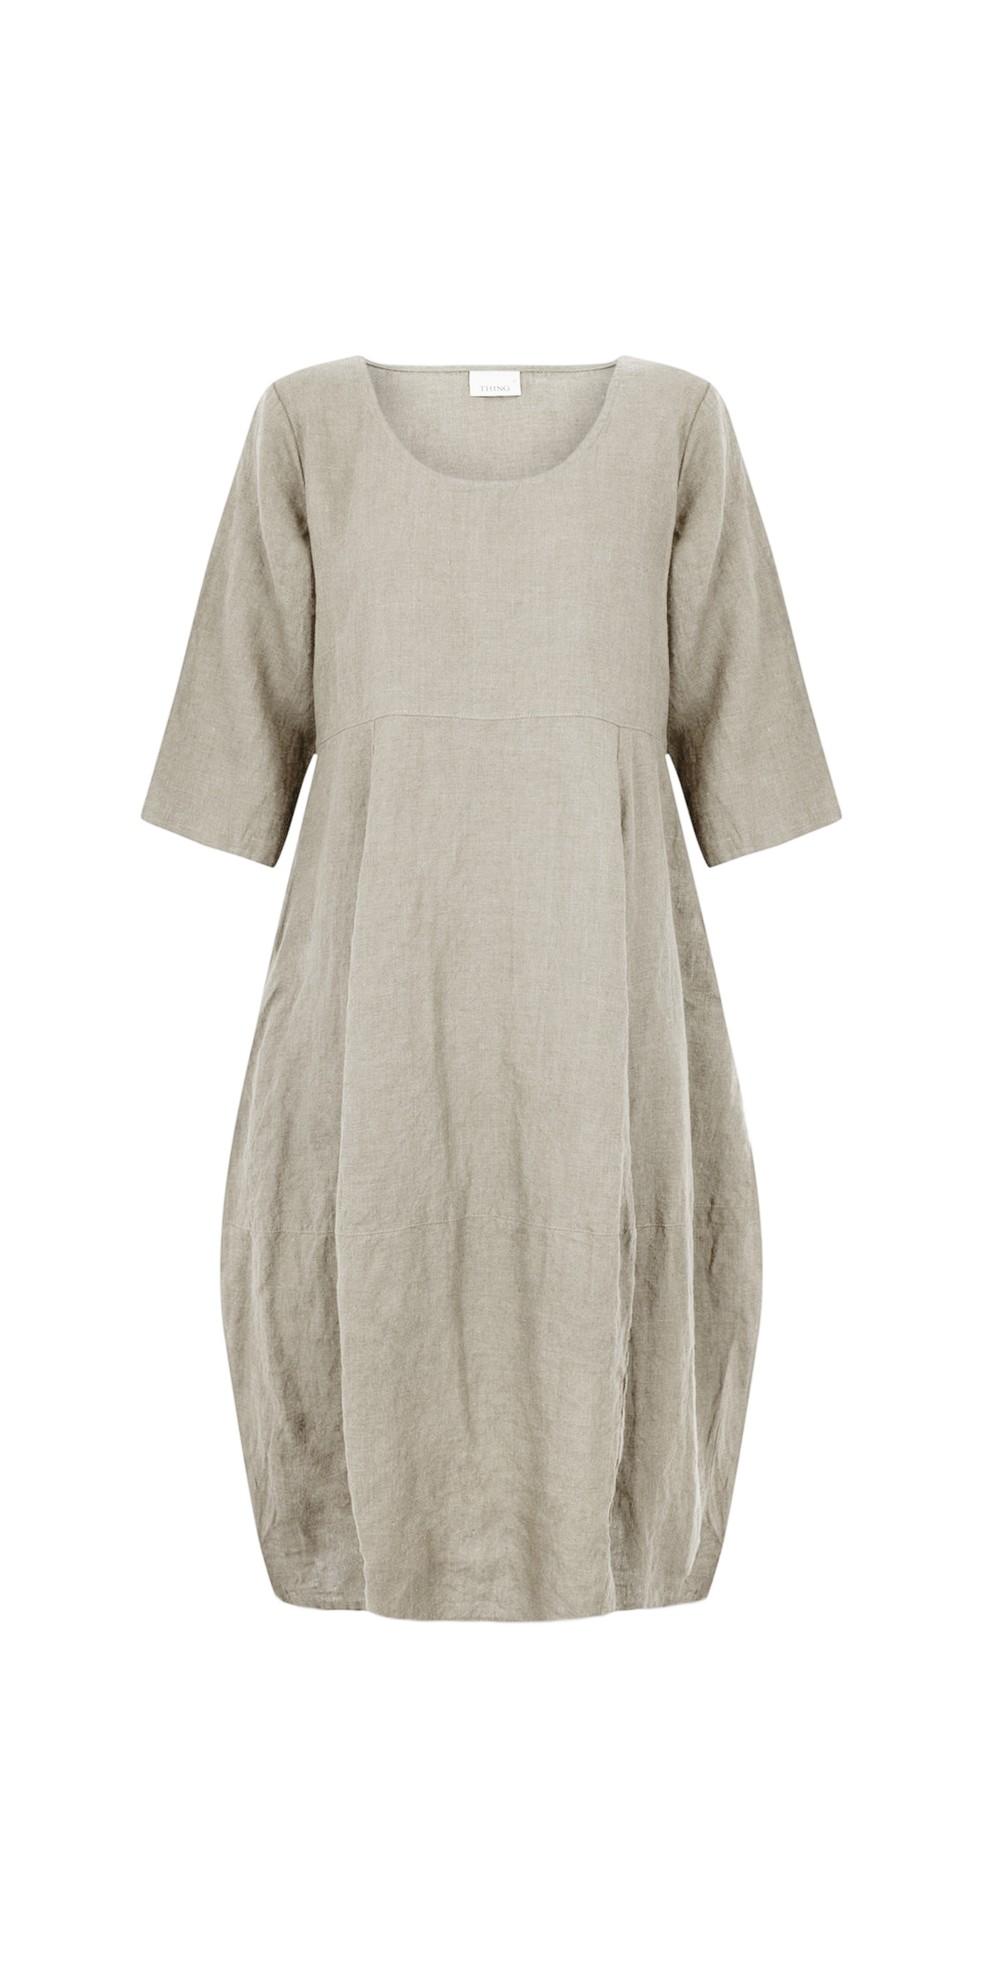 Freya 3/4 Sleeve Linen Dress main image